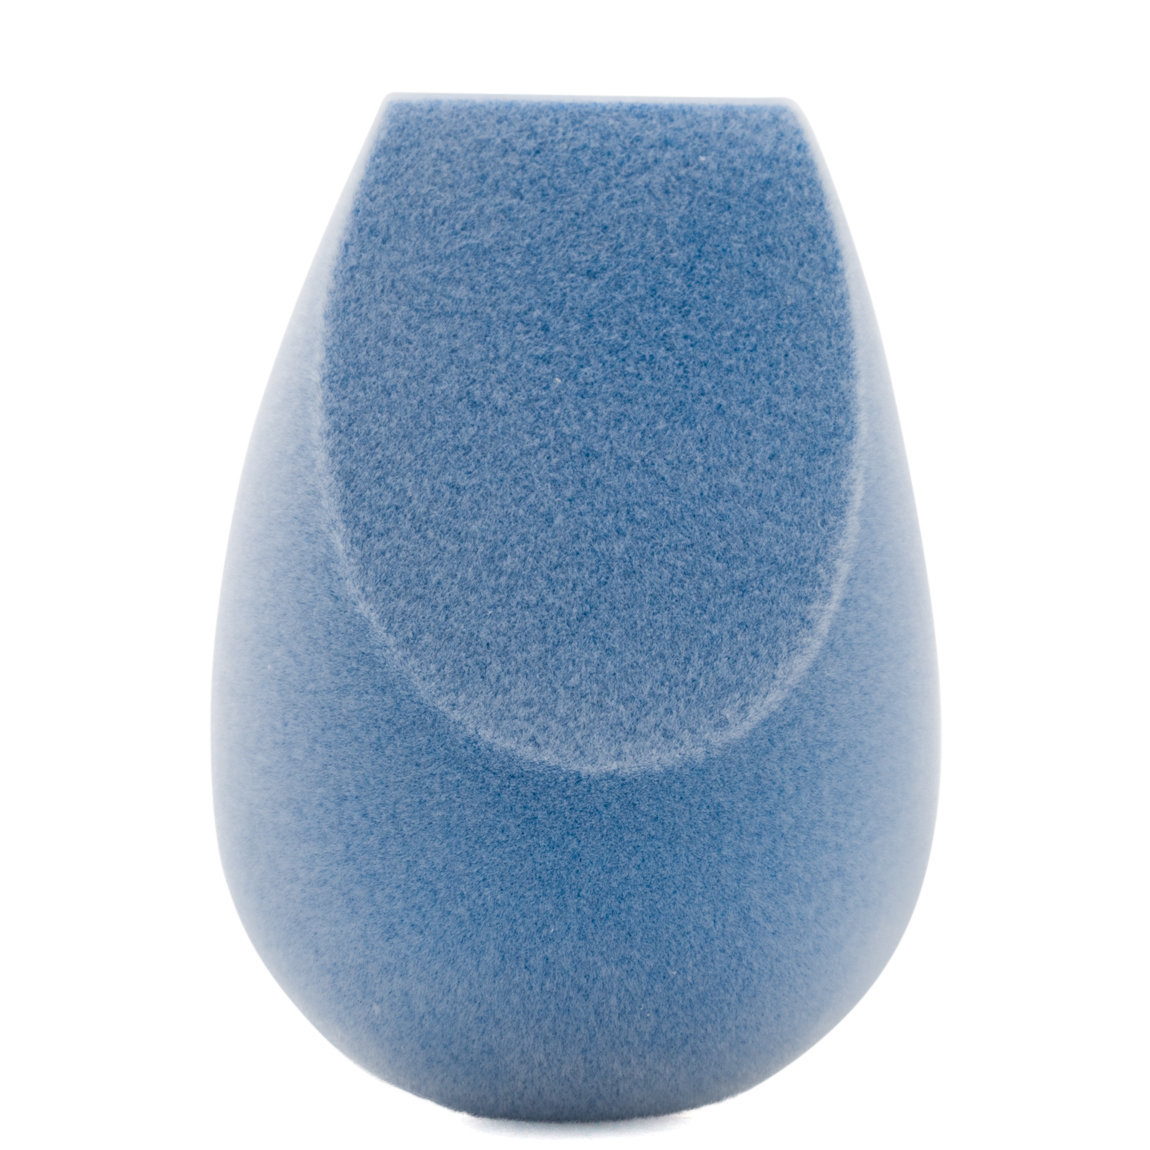 JUNO & Co. Microfiber Fusion Sponge product swatch.